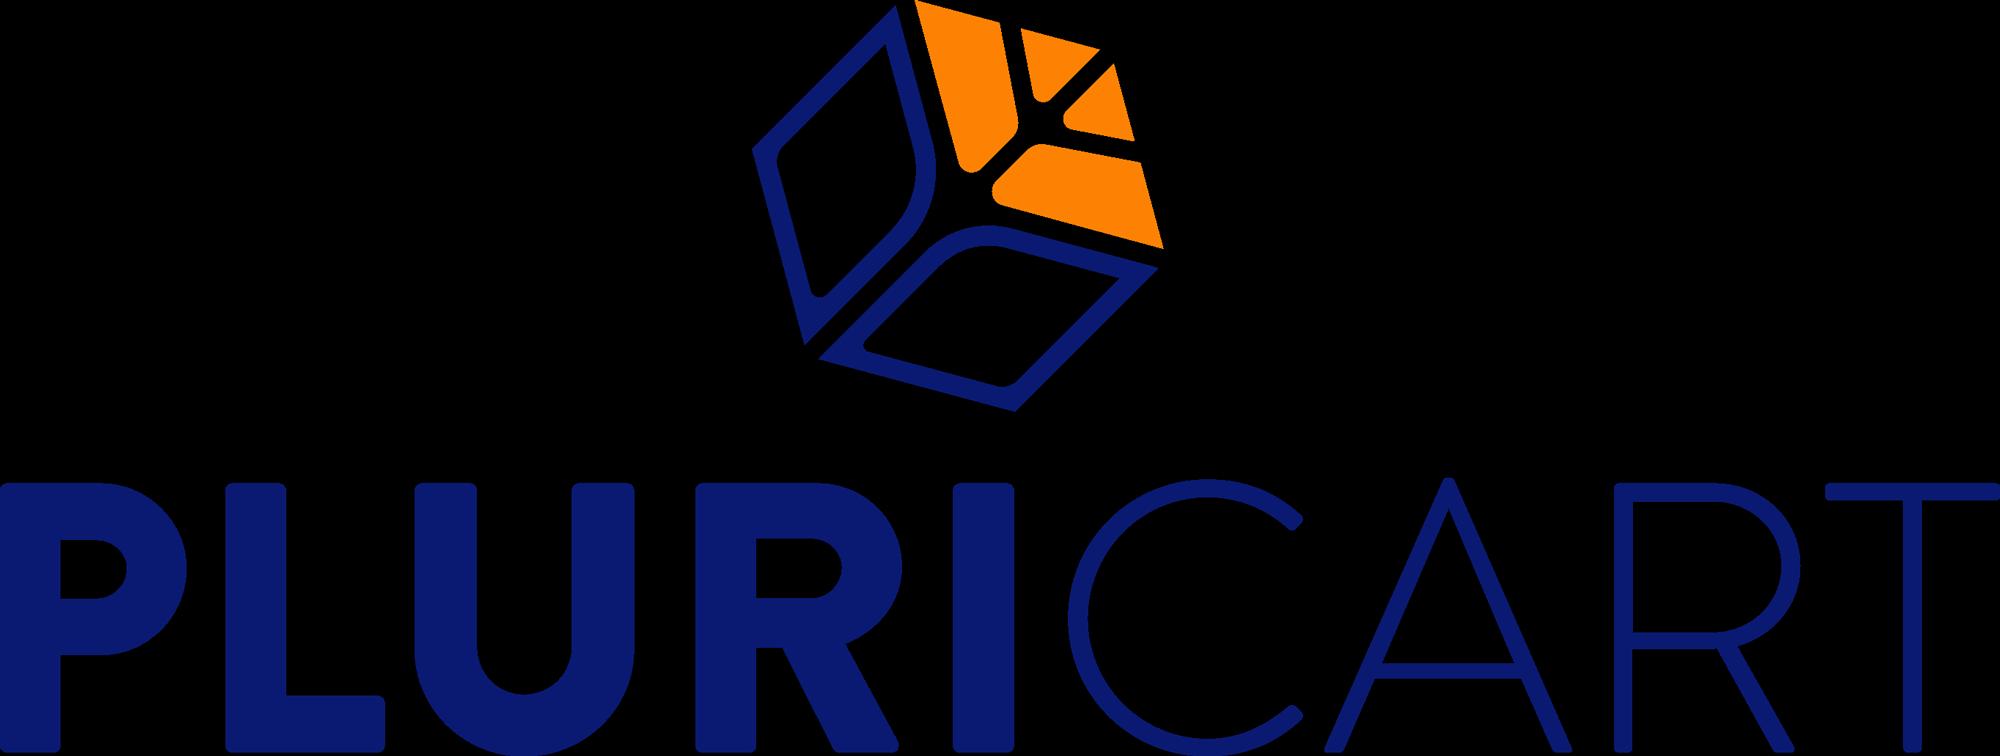 Pluricart